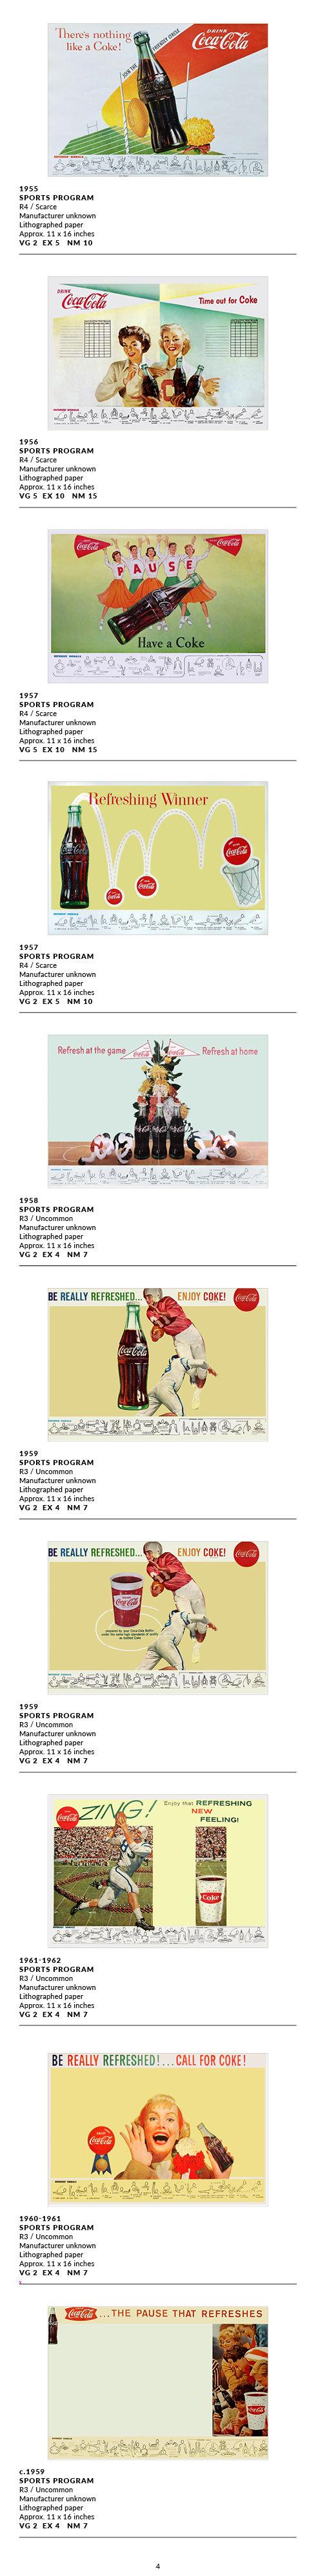 SportsPrograms_4.jpg